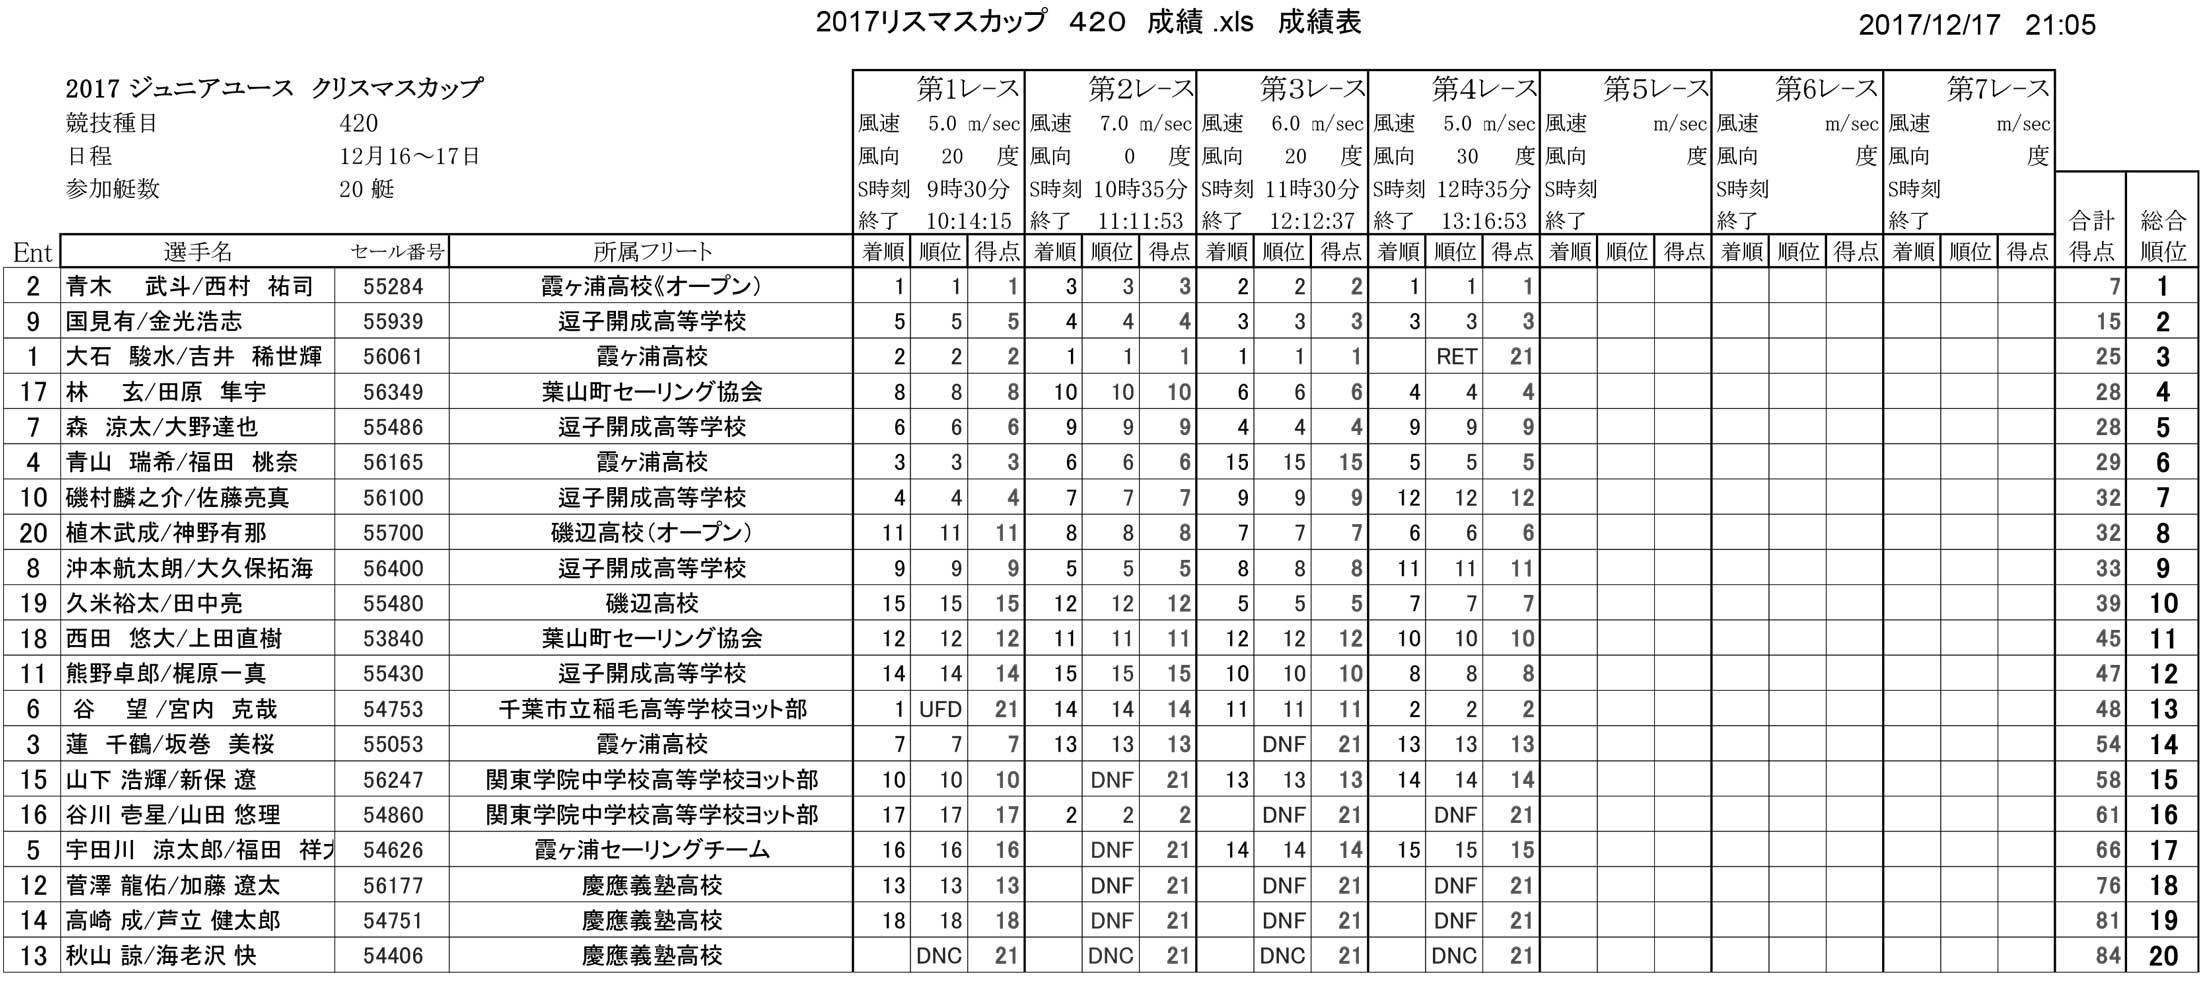 result420